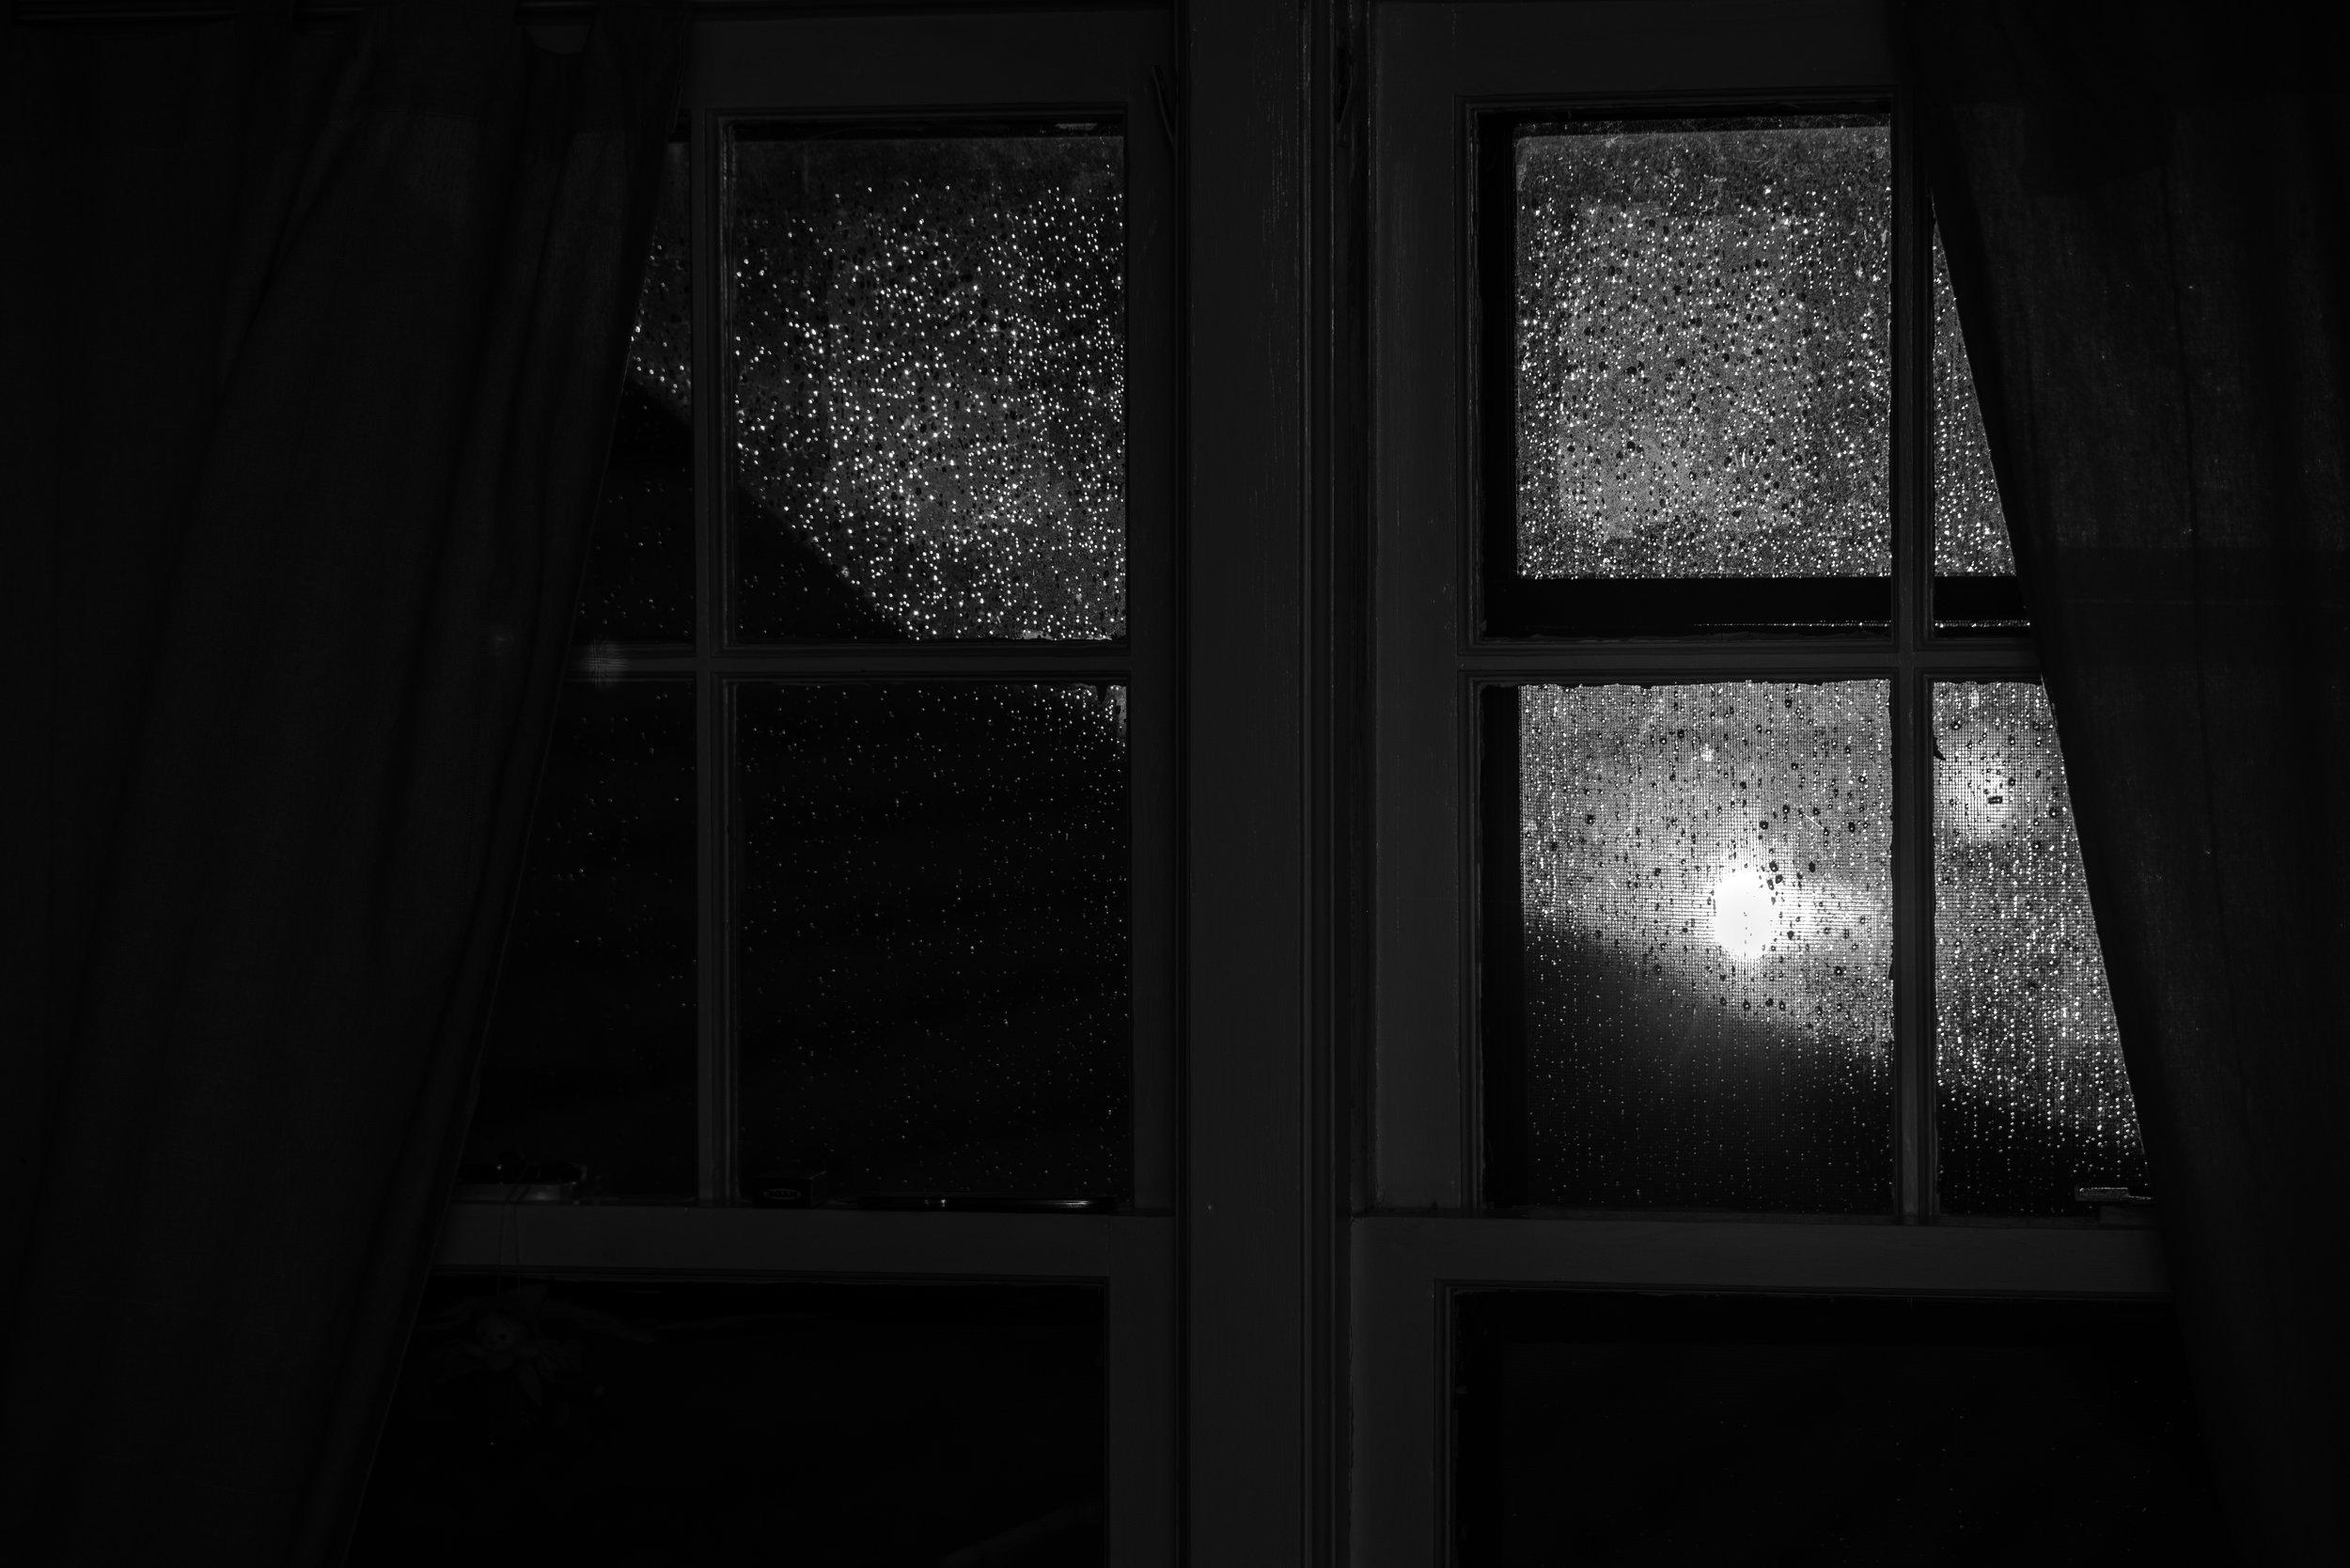 rainy window night scene.jpg